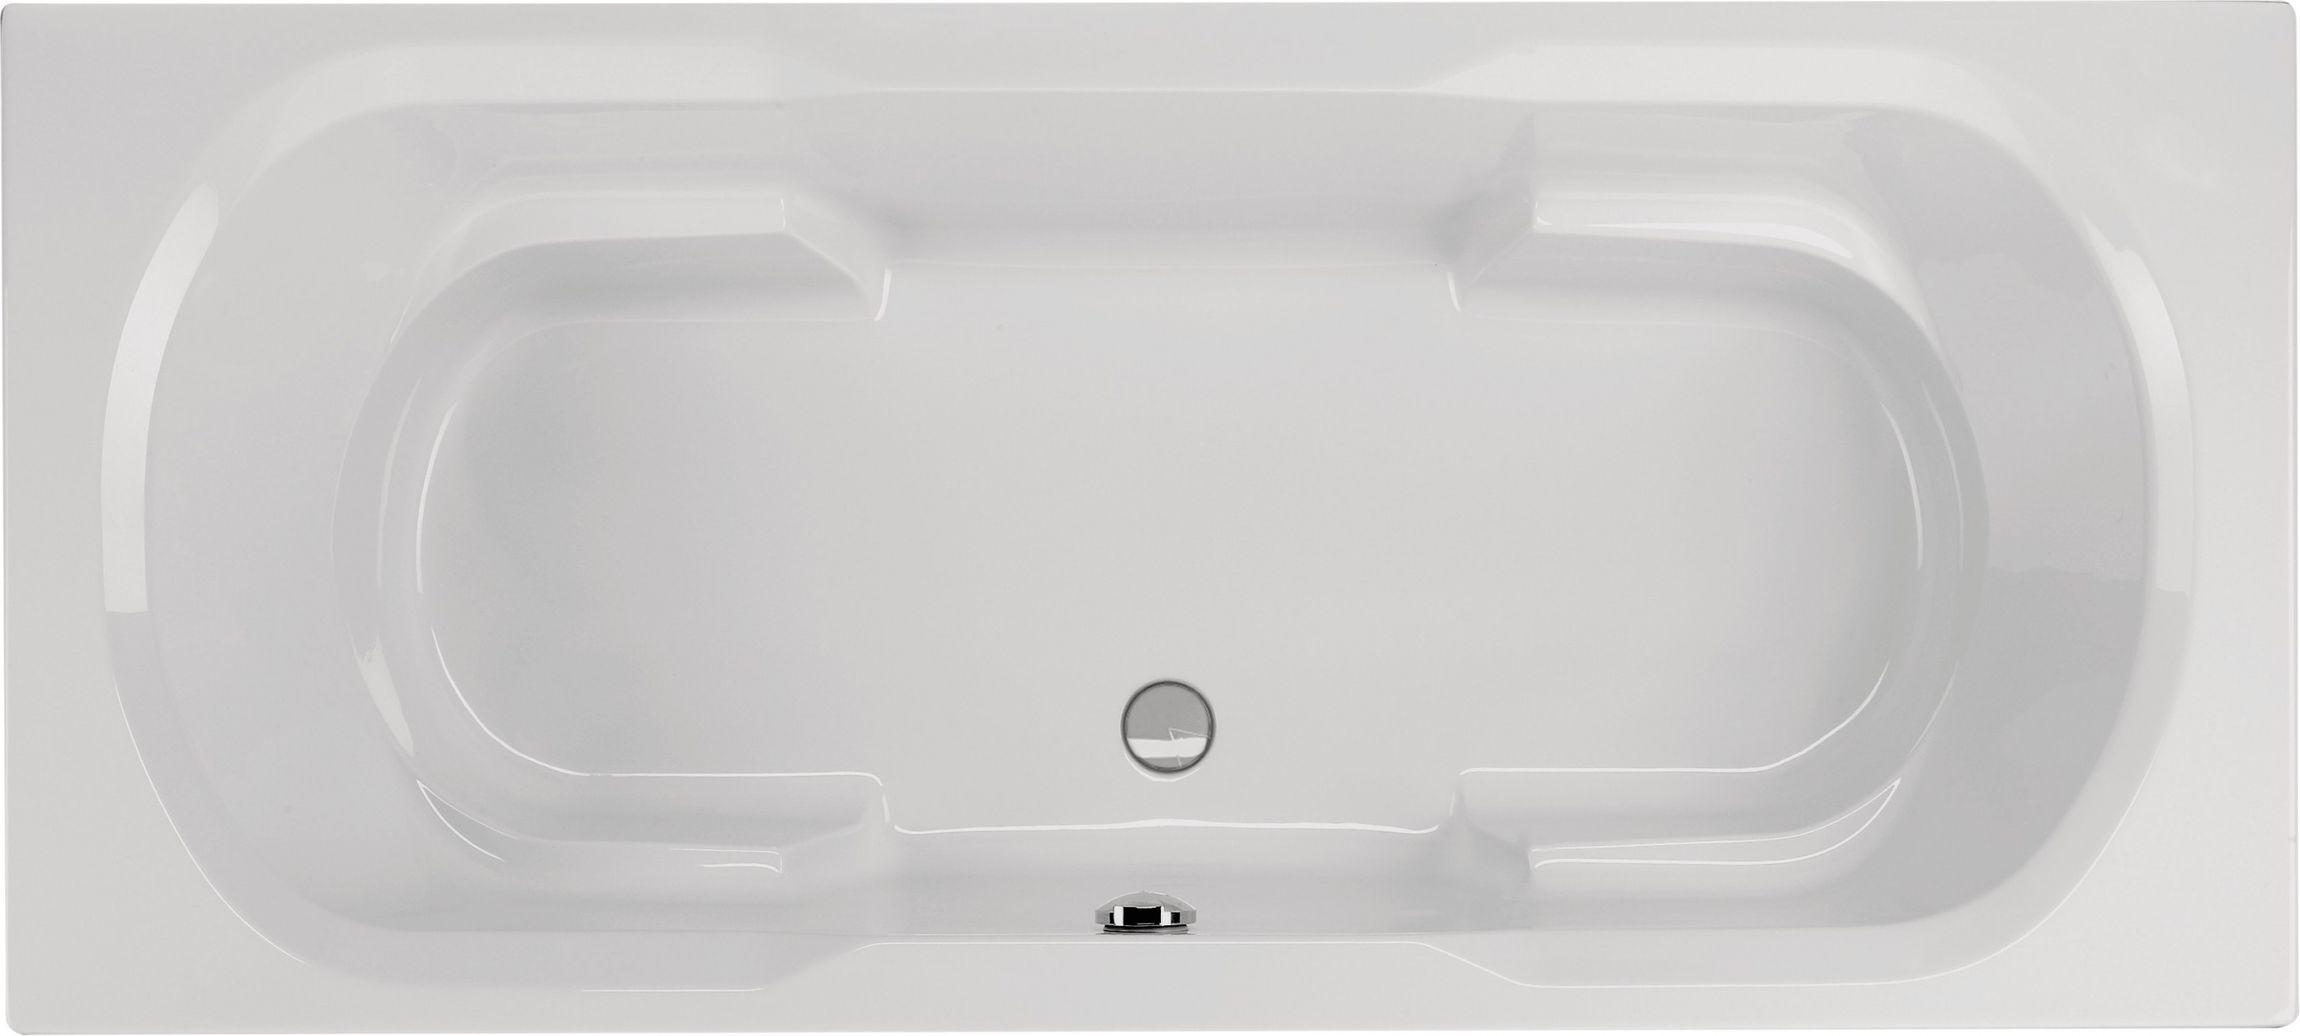 badewanne 180x80 perfect badewanne uemontegouc x cm with badewanne 180x80 good bette badewanne. Black Bedroom Furniture Sets. Home Design Ideas